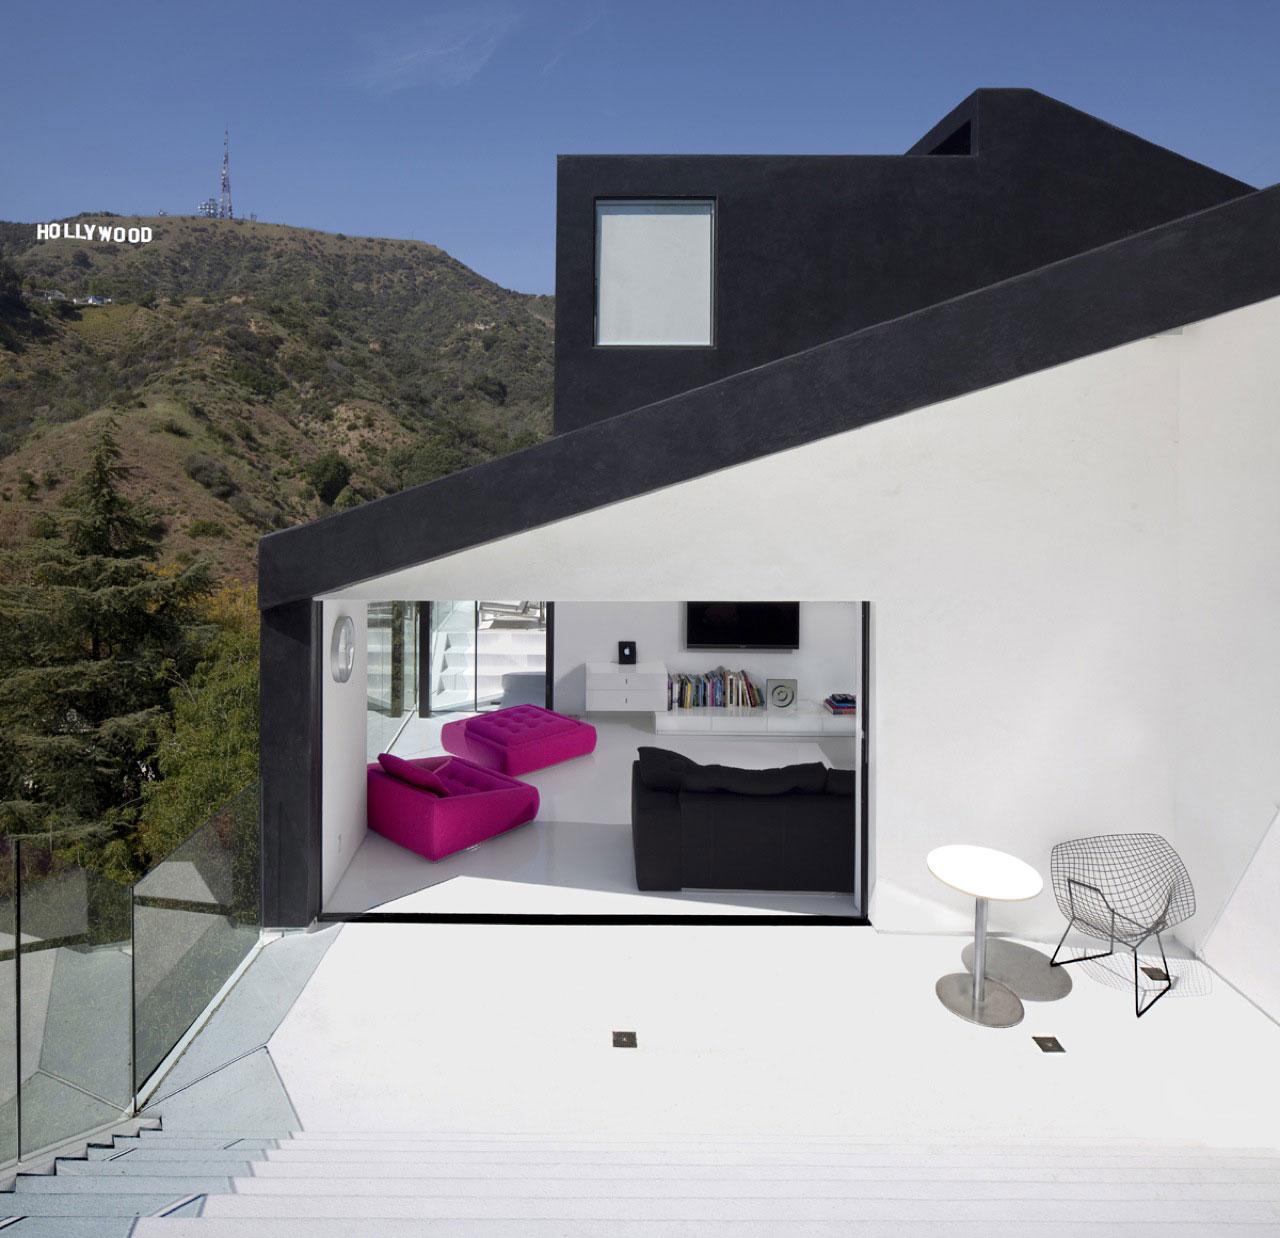 Modern Home Design October 2012: Hollywood Hills Modern Architecture